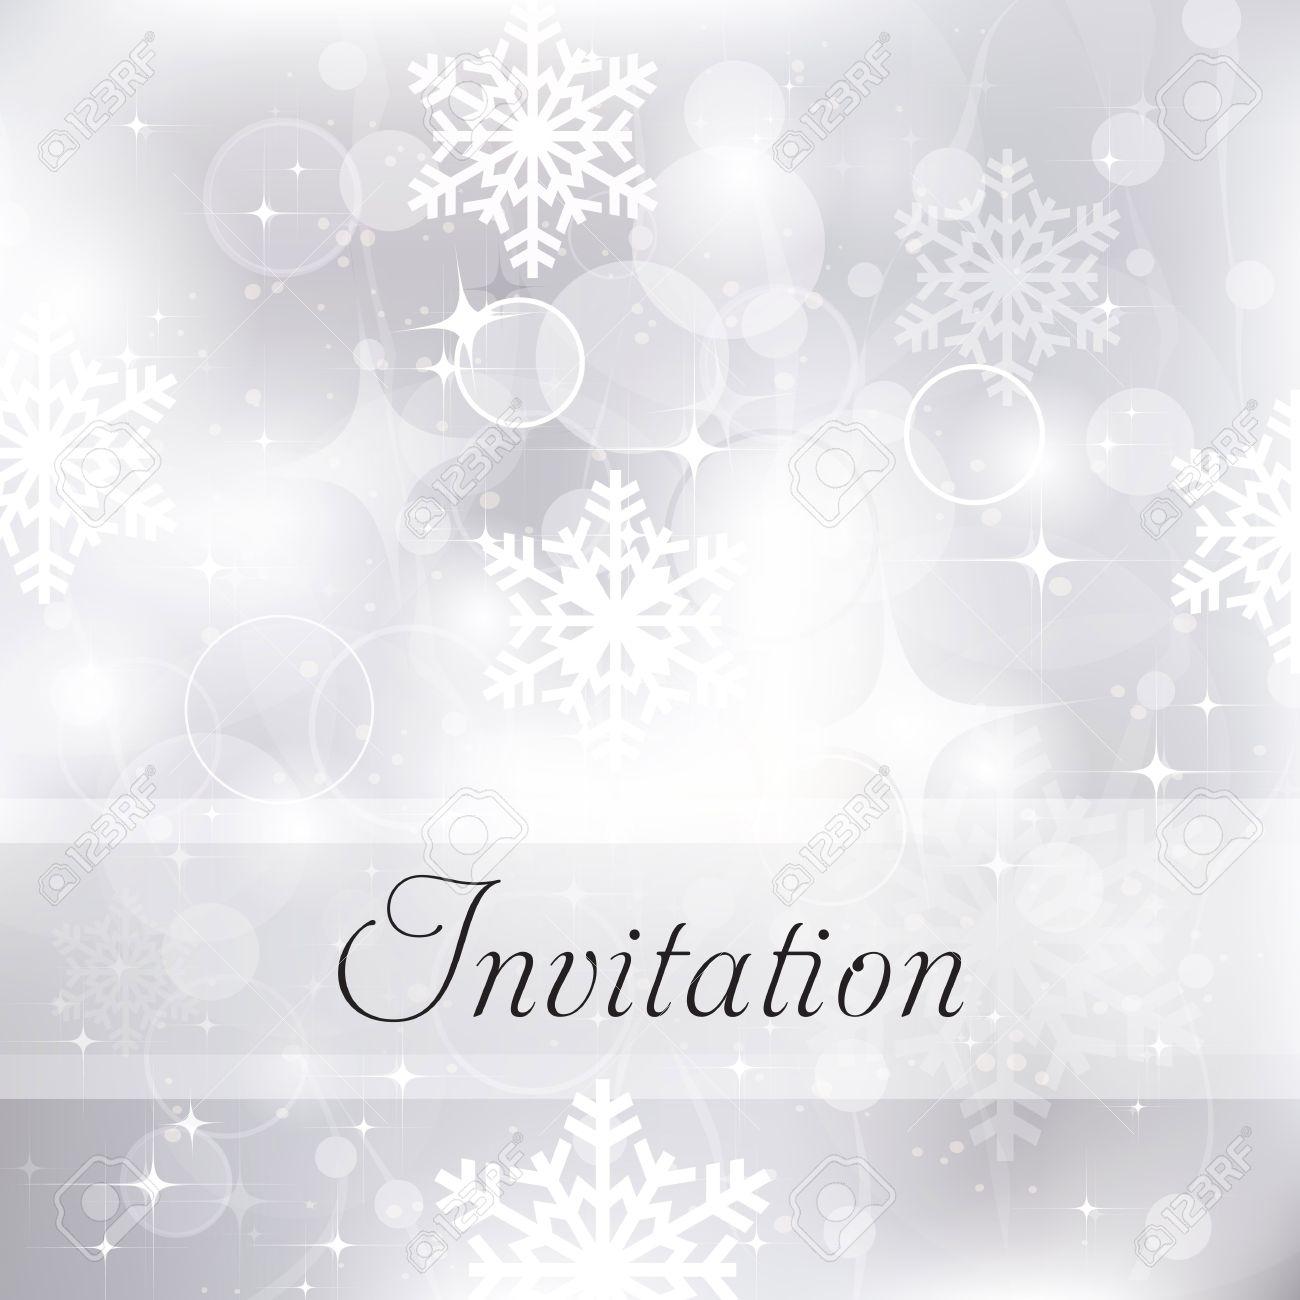 Glittery Silver Christmas Invitation Background Royalty Free ...